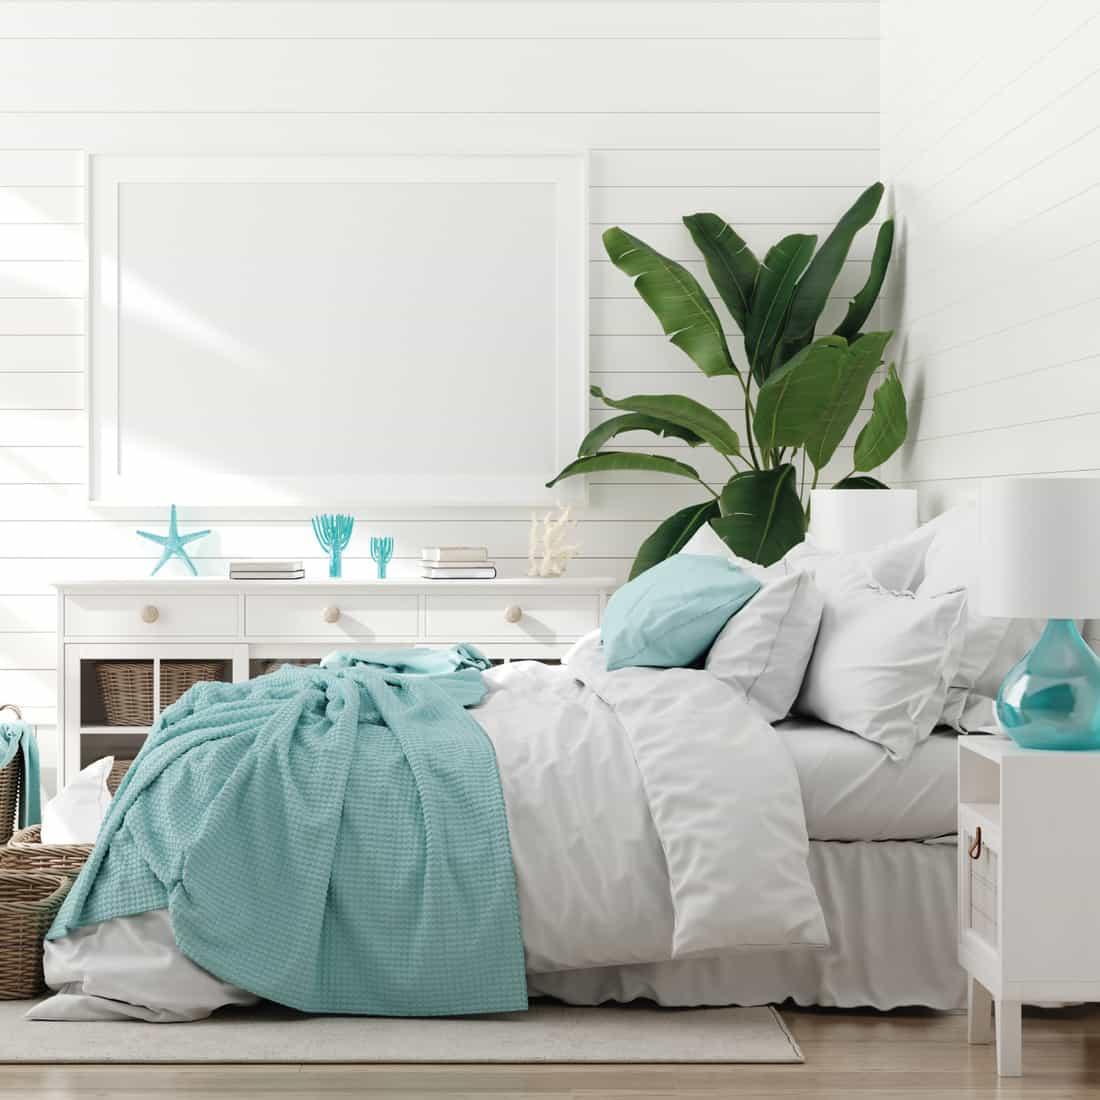 Bedroom interior, marine room with sea decor and furniture